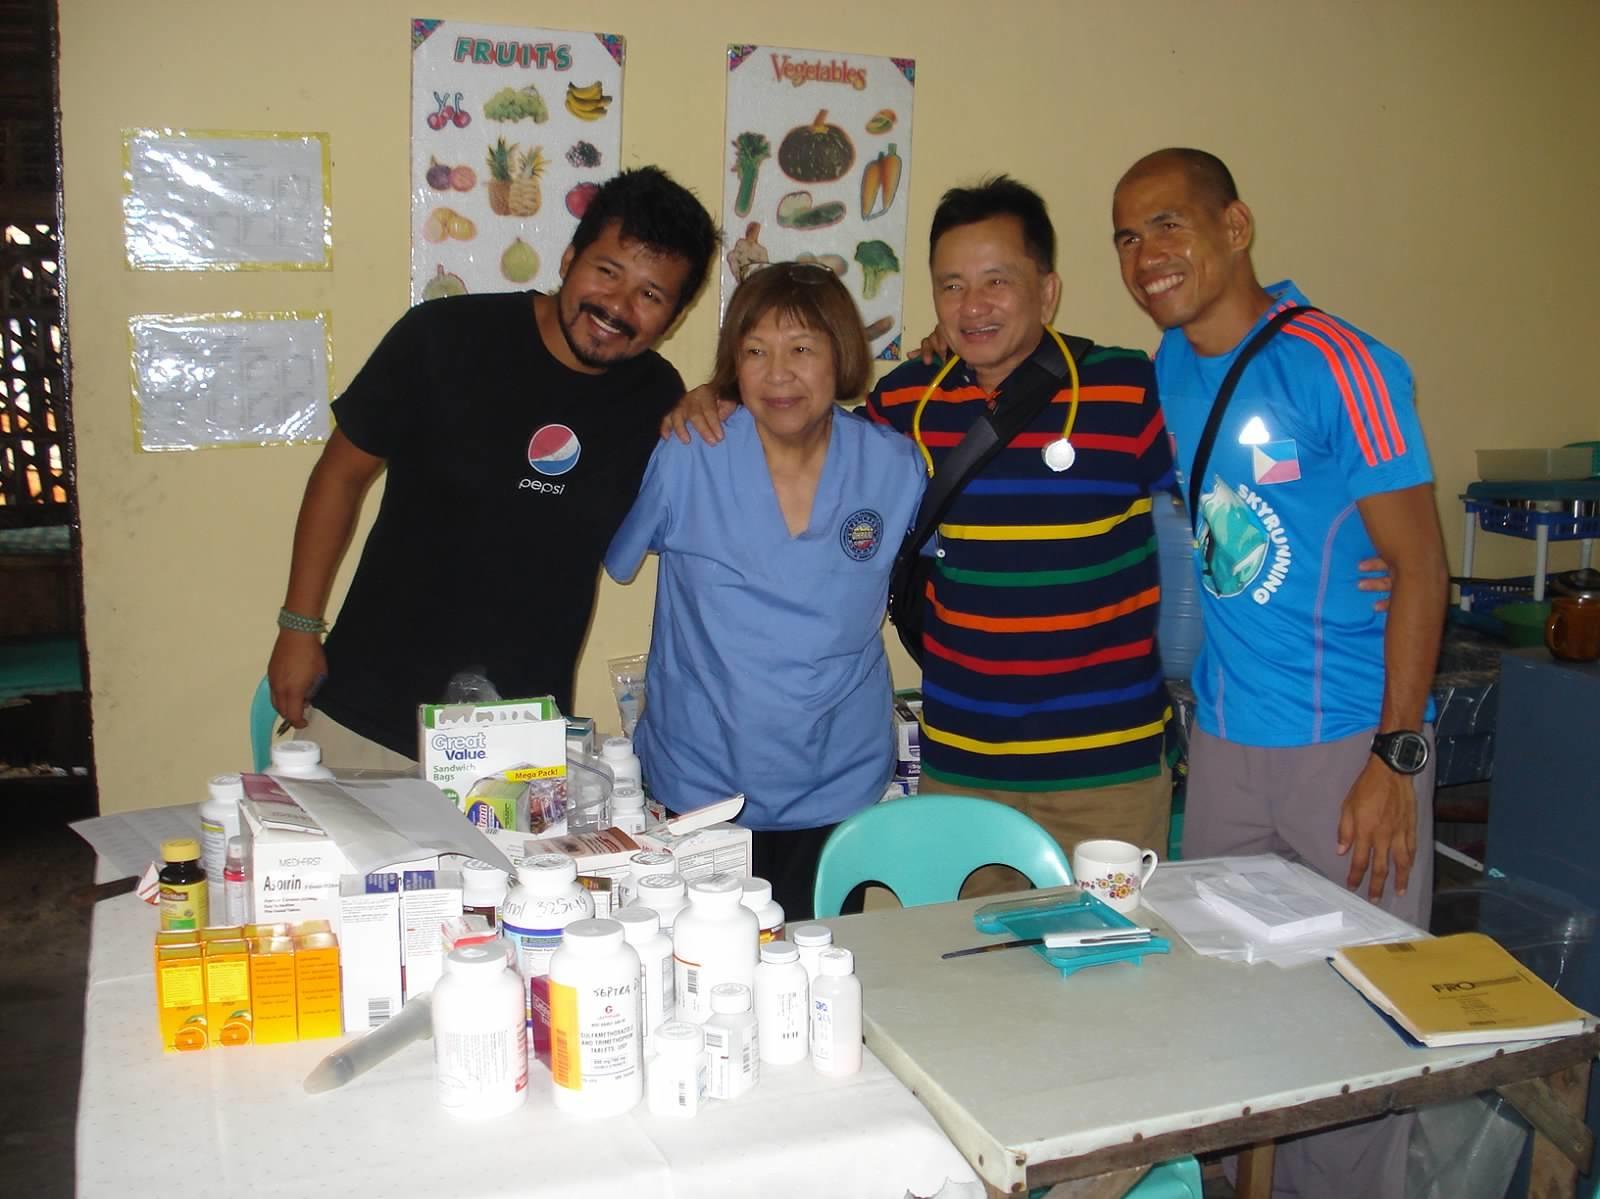 "Our pharmacy team: Eric Steiner, Peace Corps; Kay Yamagata, pharmacist; Ed Pangilinan, team administrator; ""Jun"" Ramirez, University of the Philiippines outreach team"